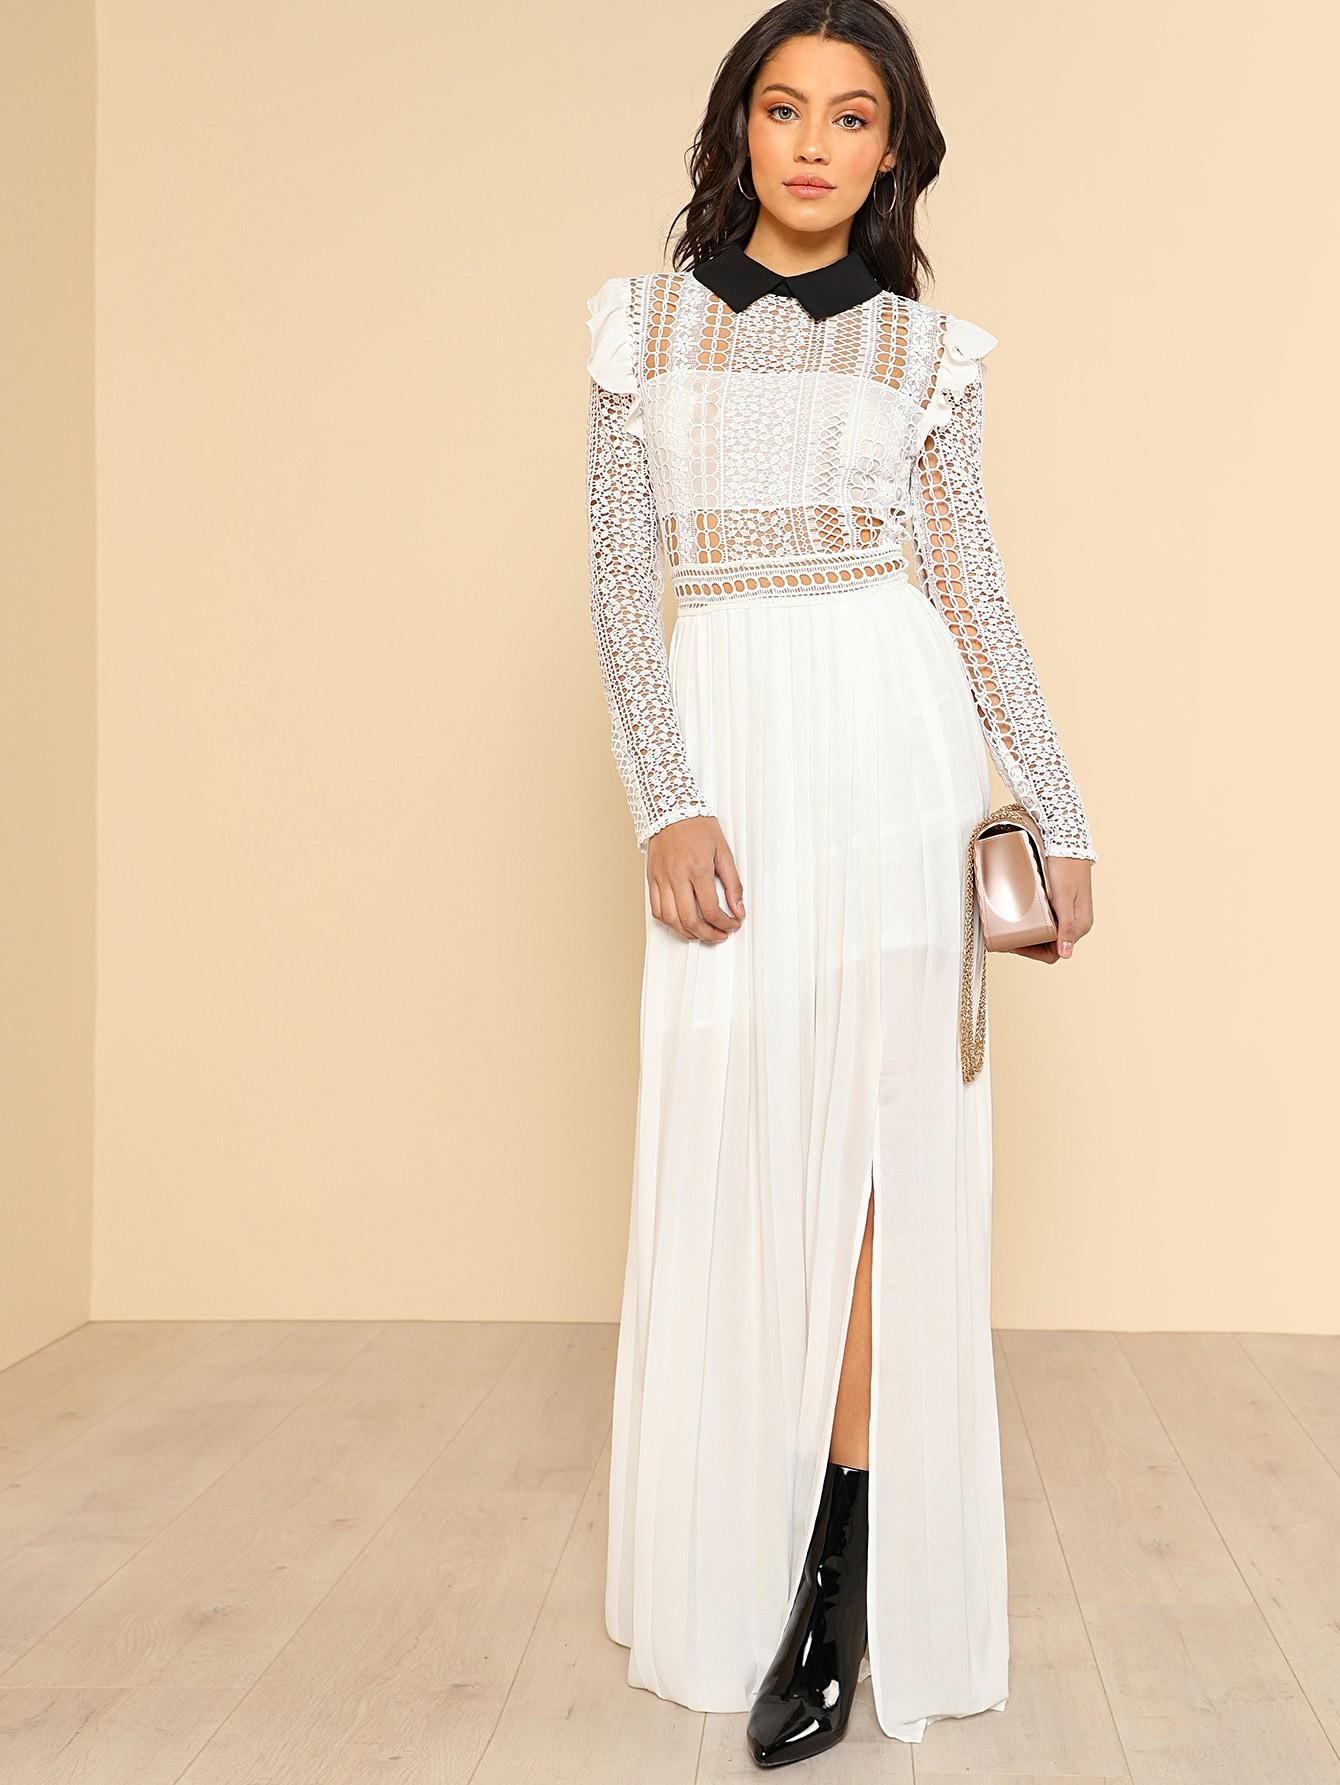 Contrast Collar Lace Bodice Pleated Dress contrast mesh box pleated plain dress